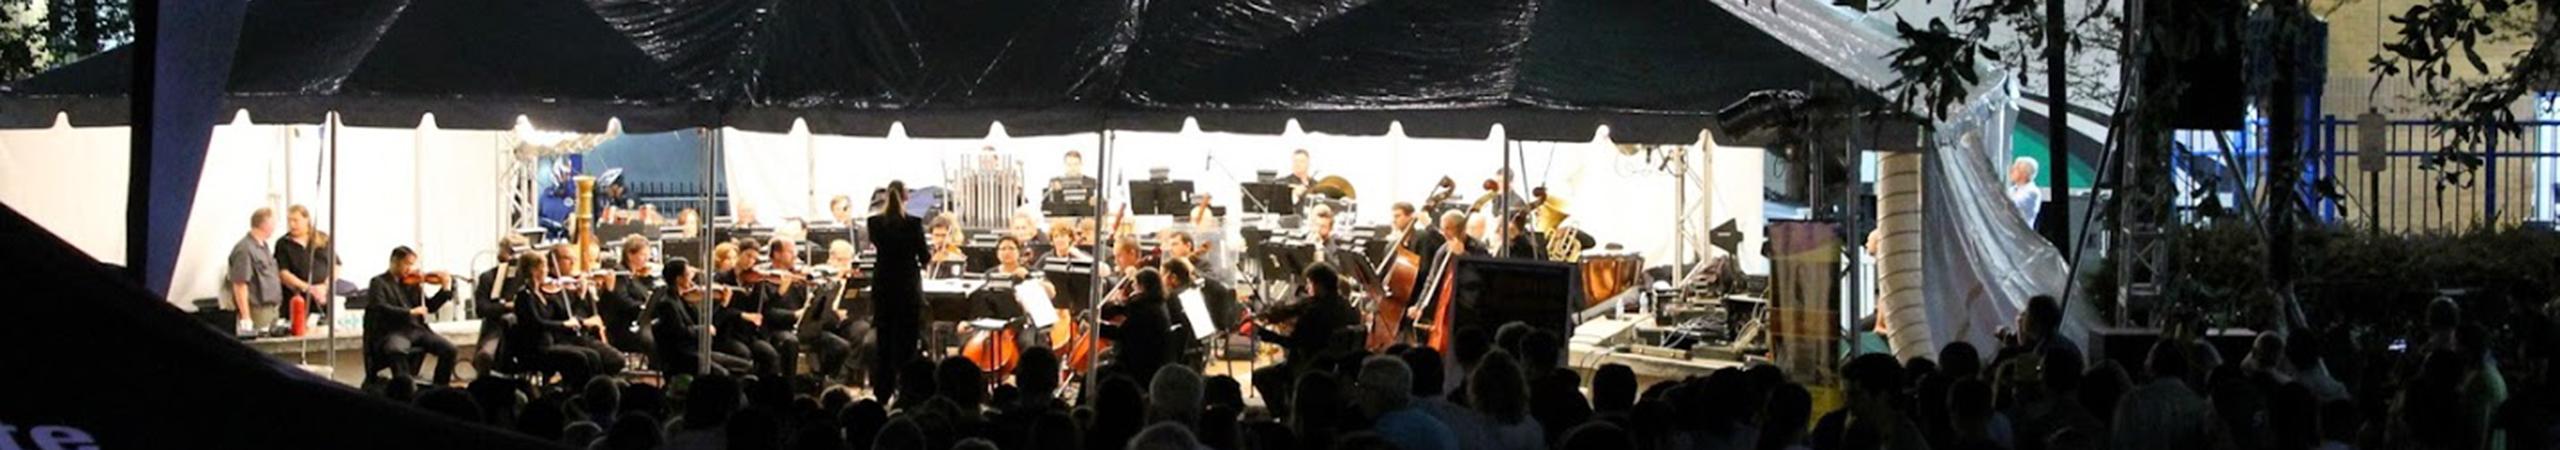 Jacksonville Symphony Orchestra at Artwalk